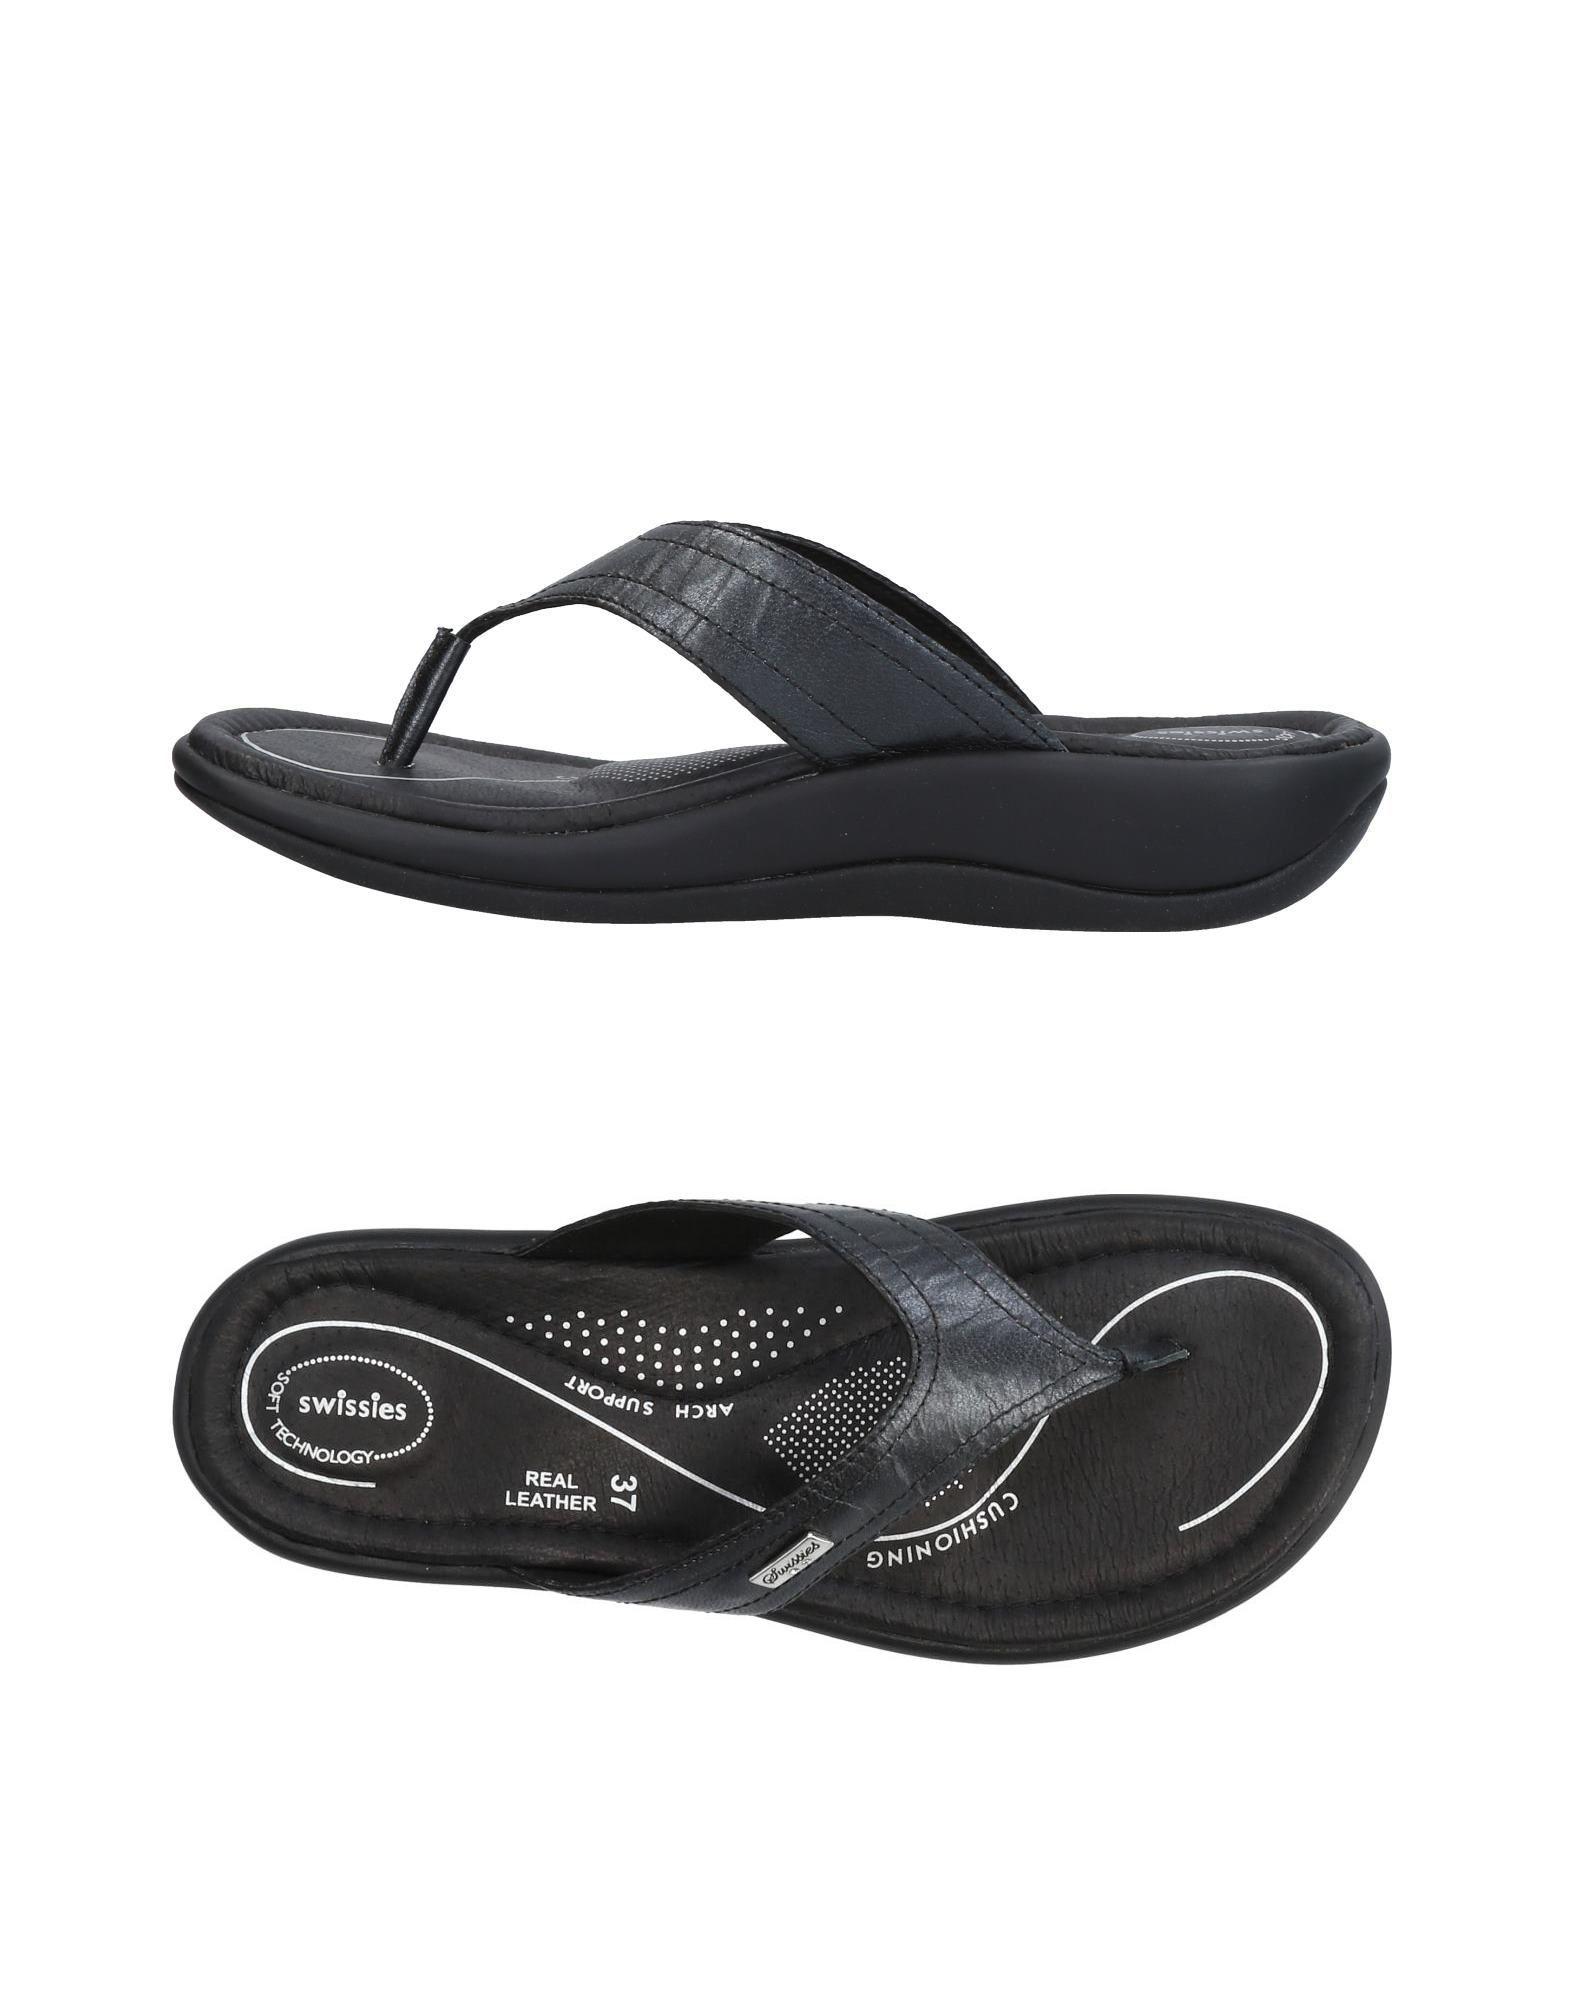 Swissies Dianetten Damen  11439203IR Gute Qualität beliebte Schuhe